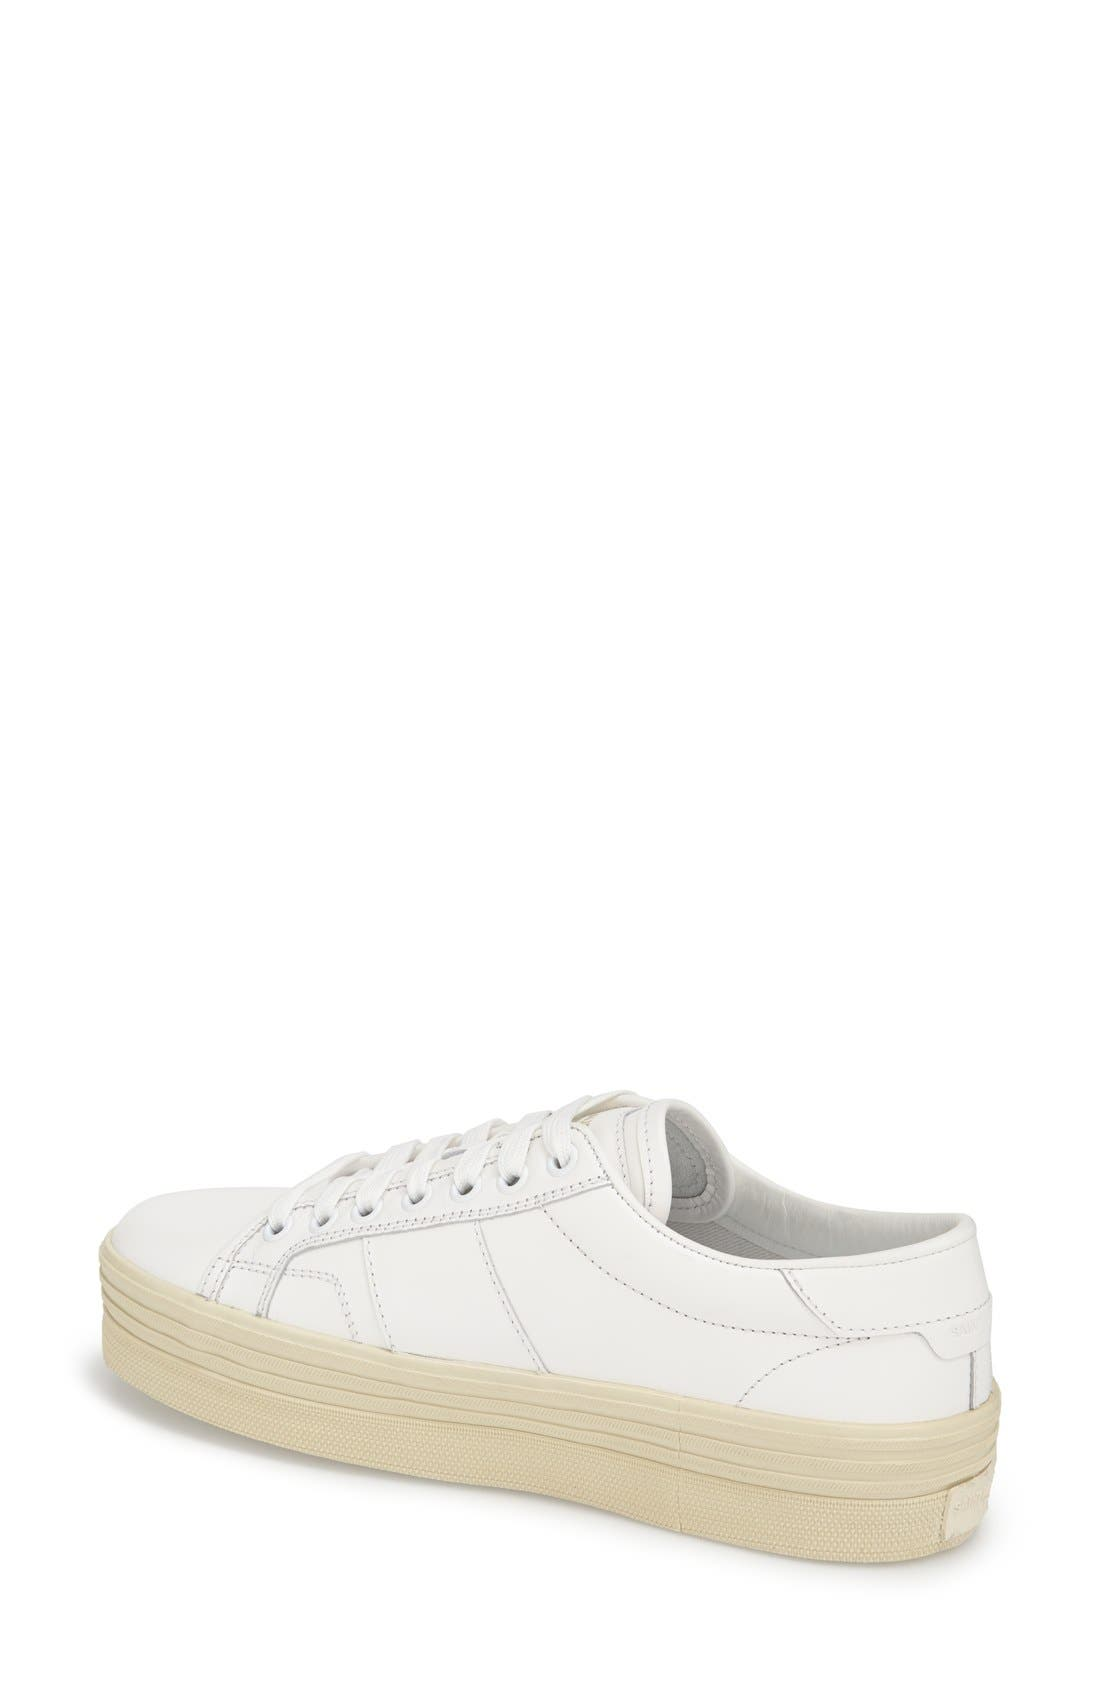 Double Sole Sneaker,                             Alternate thumbnail 3, color,                             100